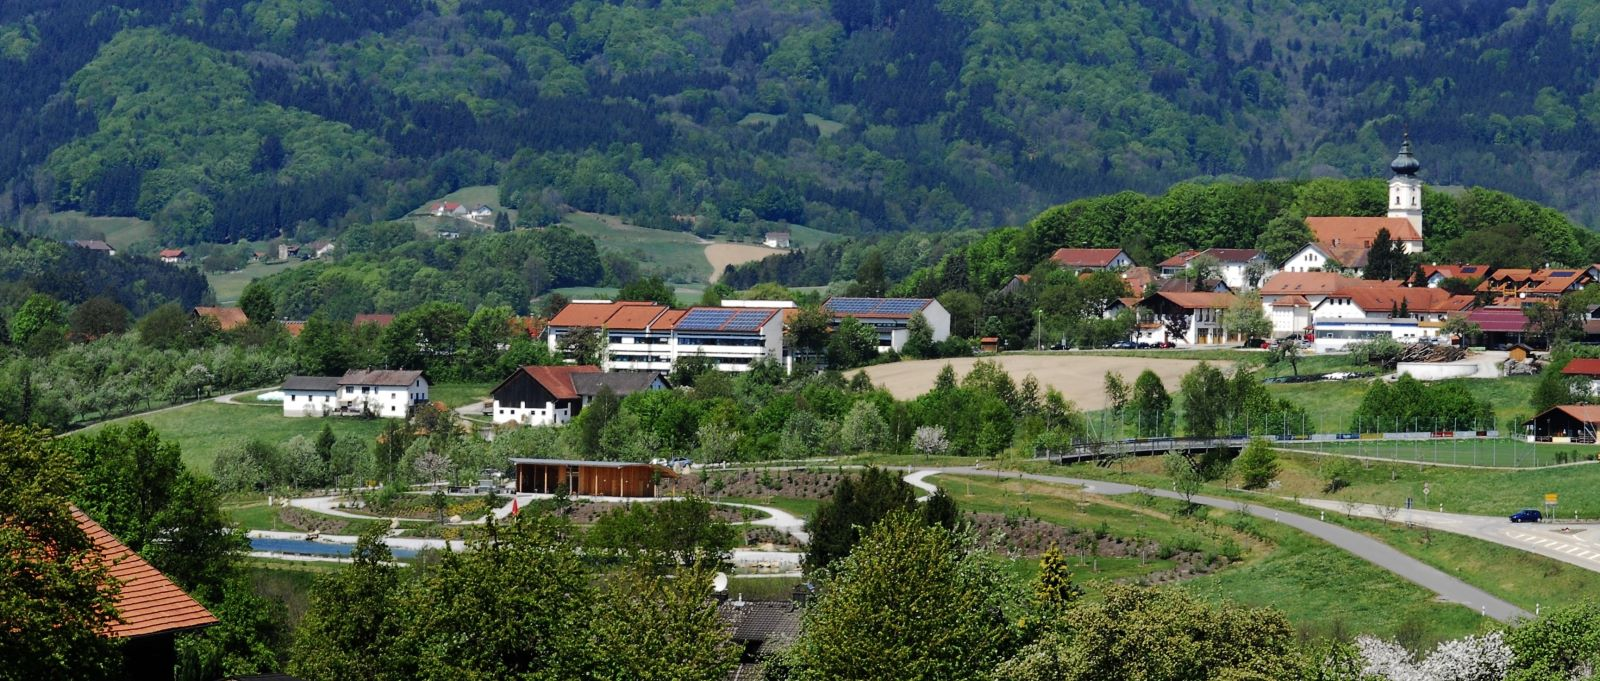 Monteurunterkunft bei Deggendorf - Günstige Übernachtung in Lalling / Hunding